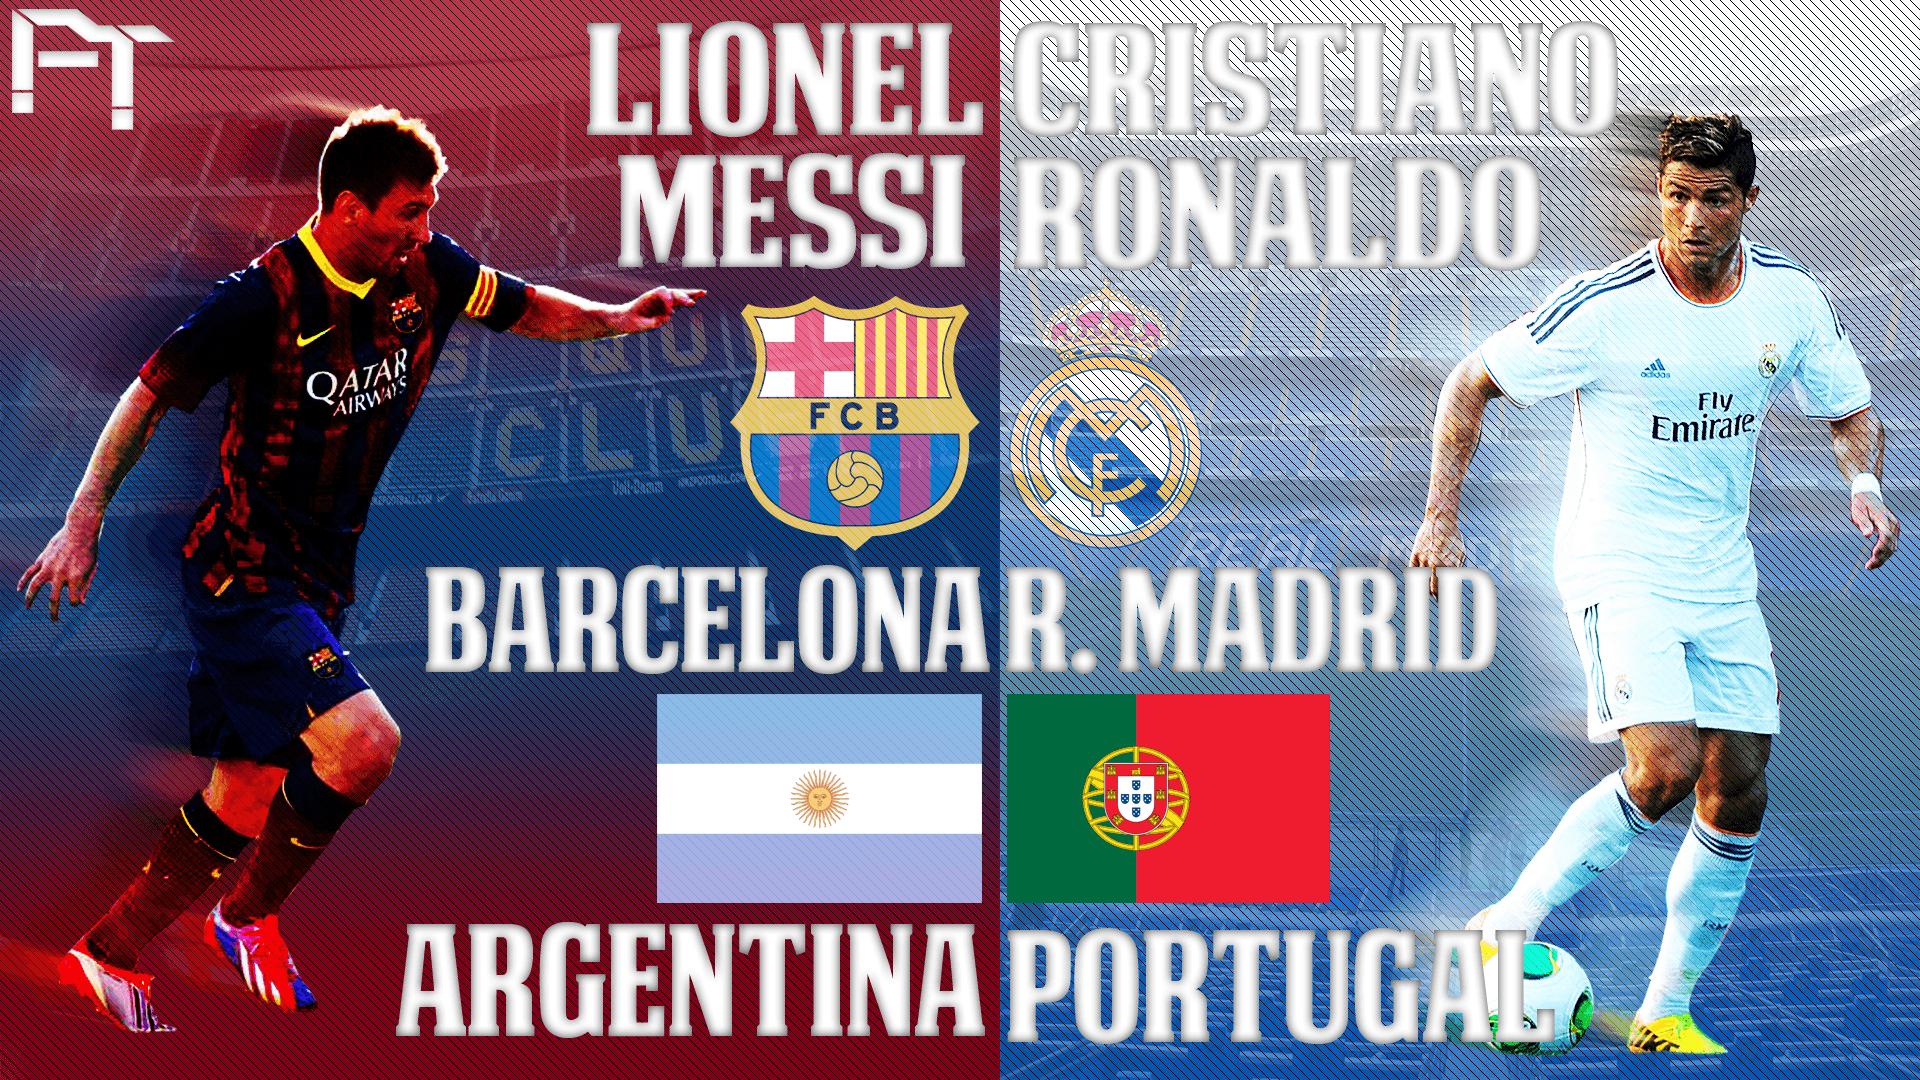 Ronaldo Vs Messi Wallpaper 2014 C Ronaldo Vs Me...